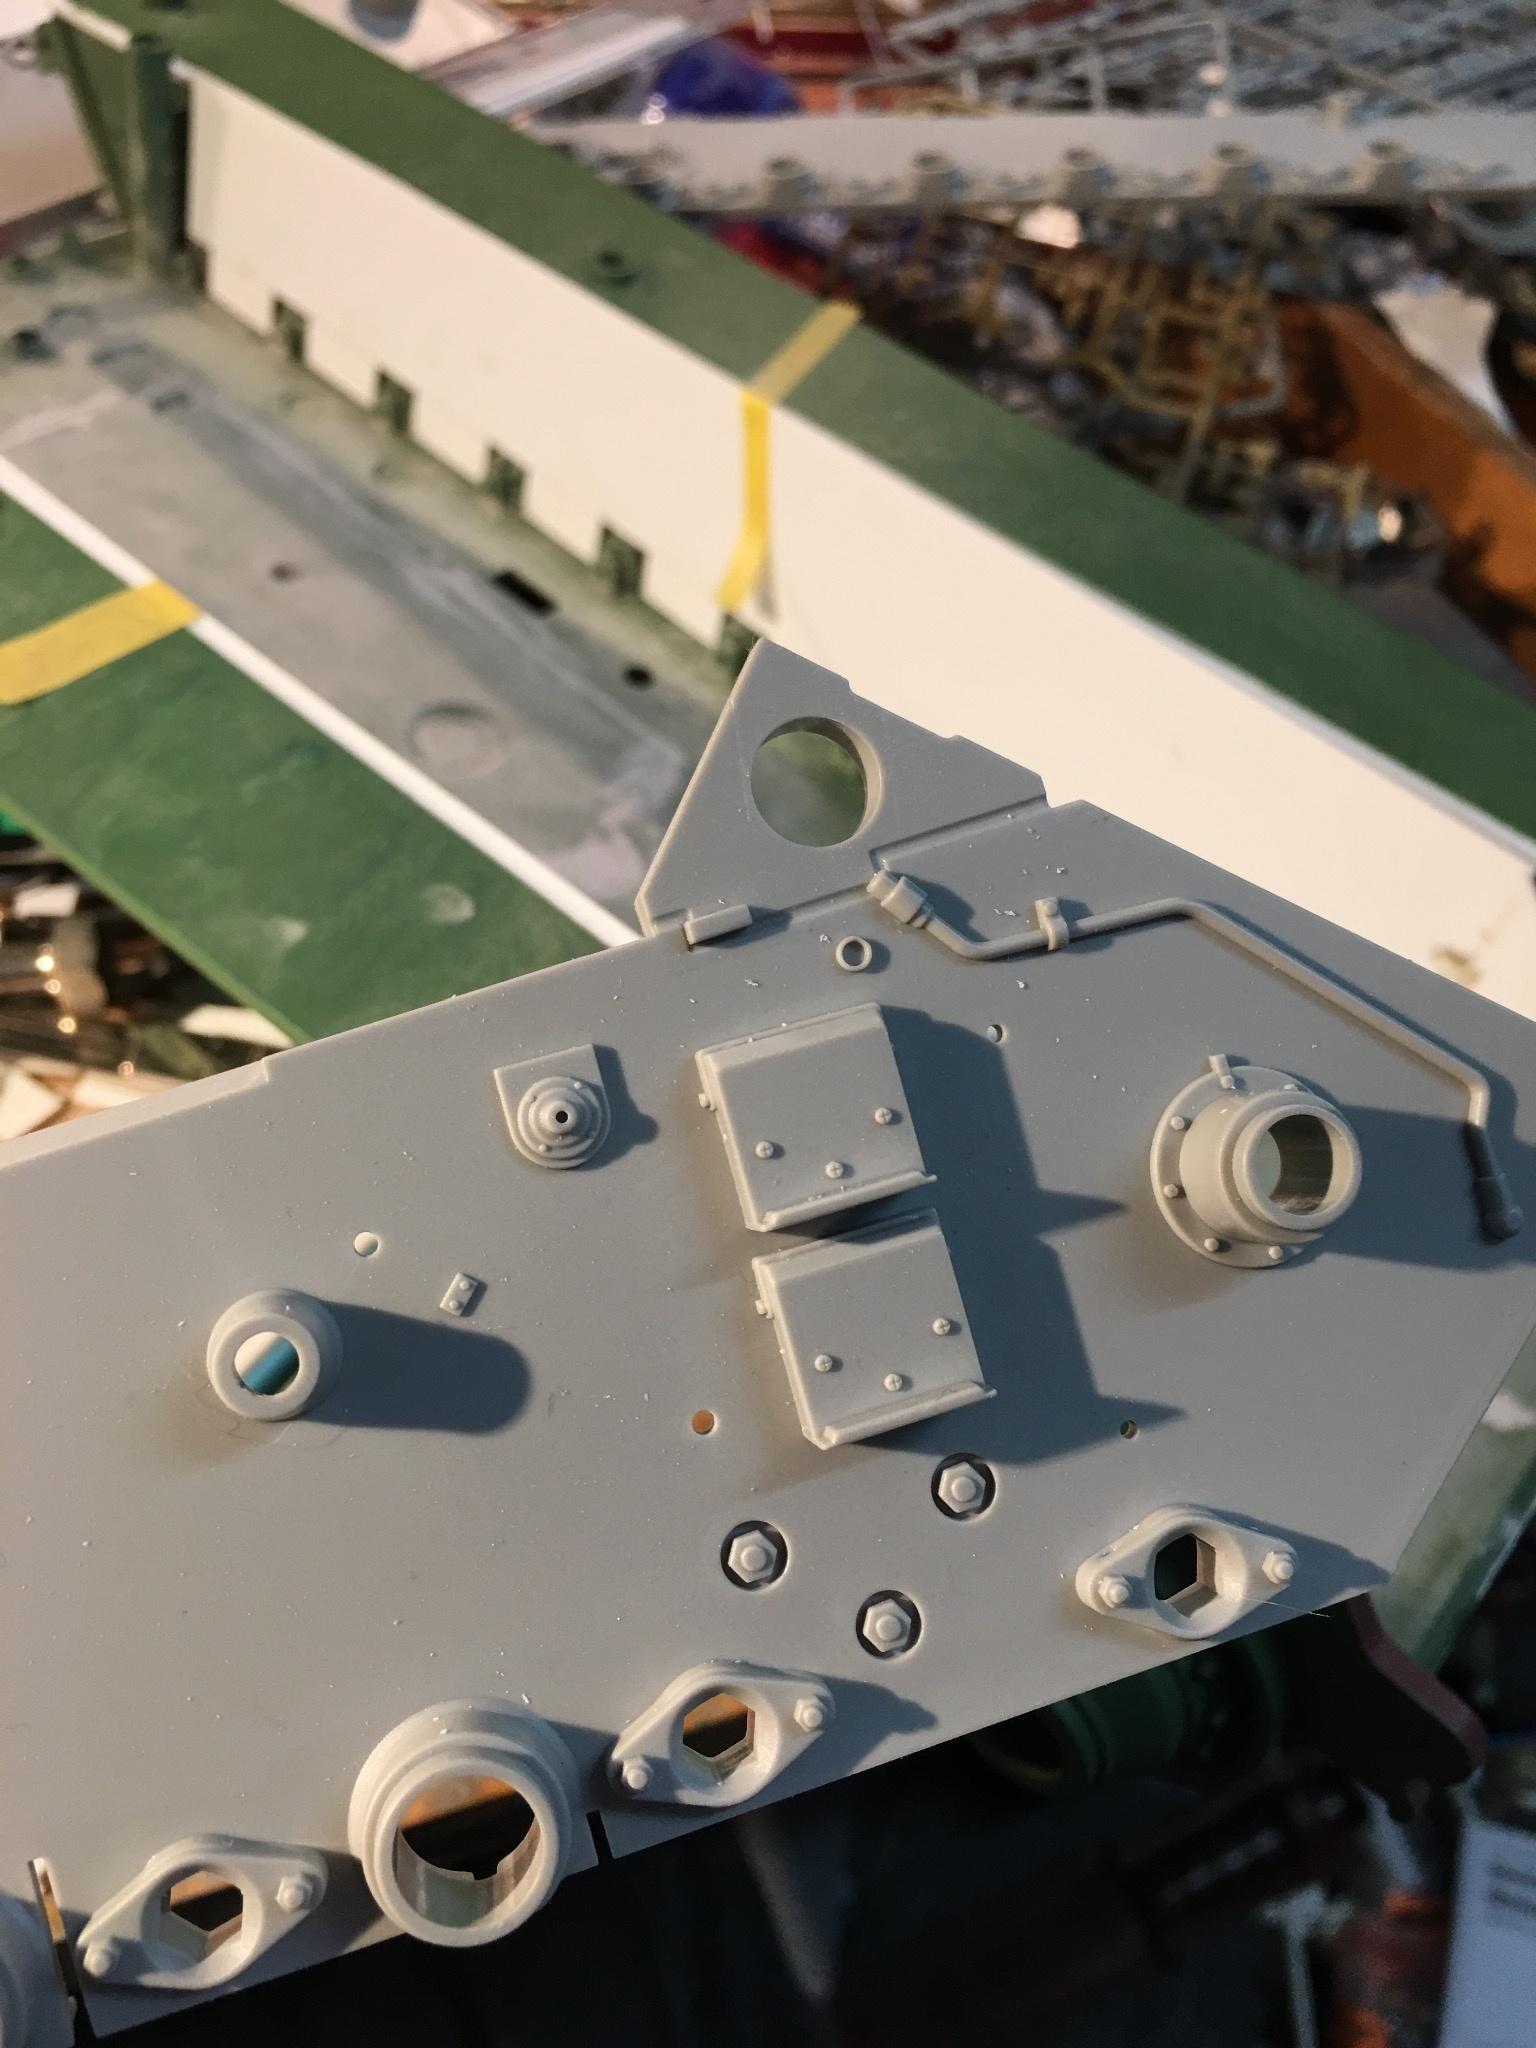 ED8C1E16-04D0-43FD-A7B3-63CCF98E3306.jpeg